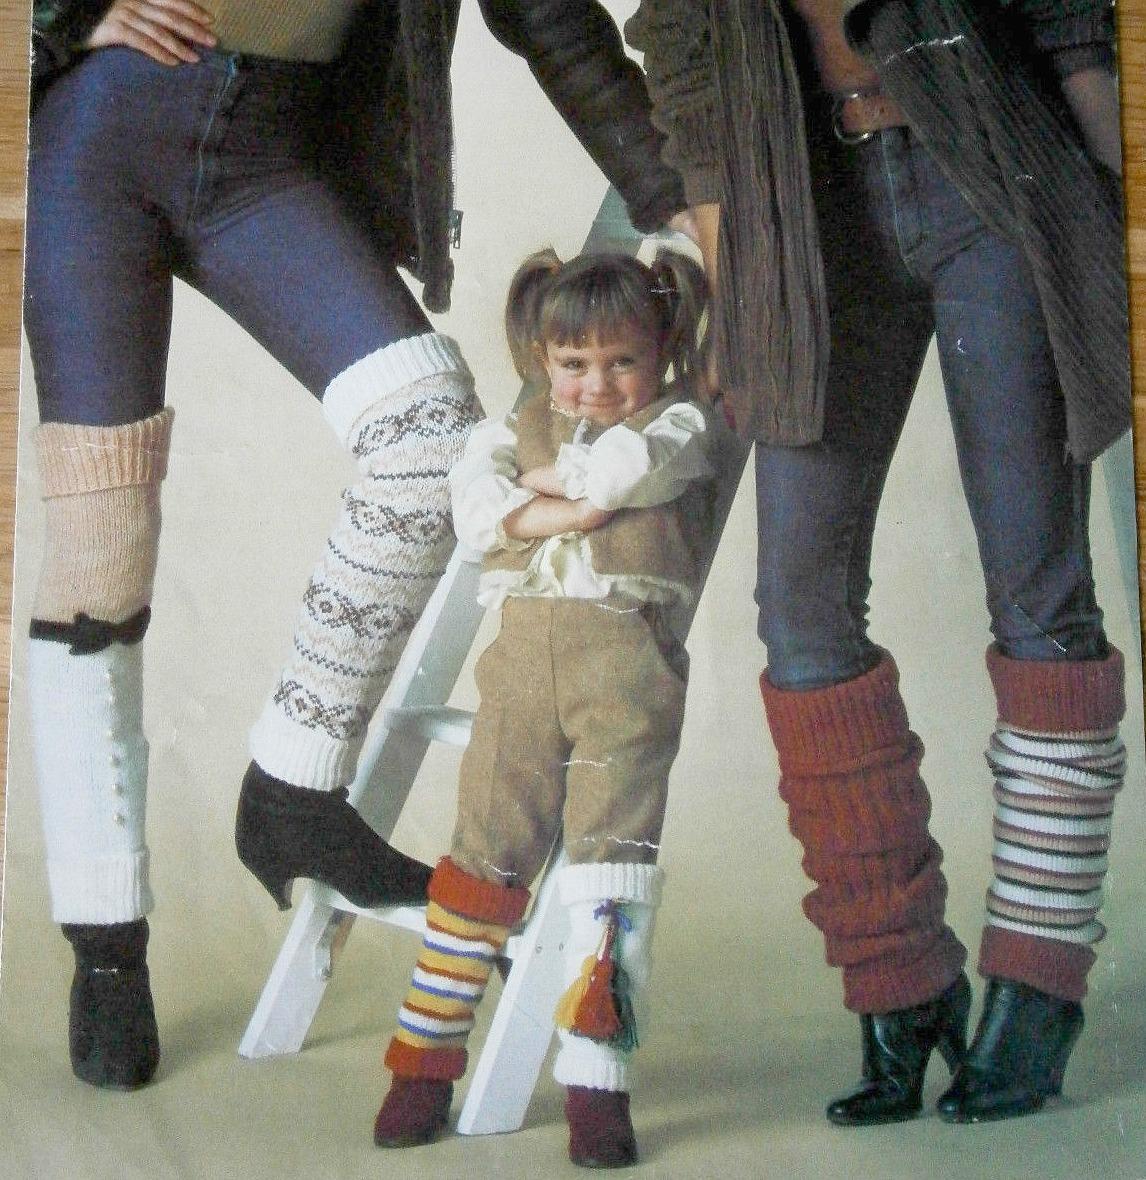 Leg warmers 80s style dresses